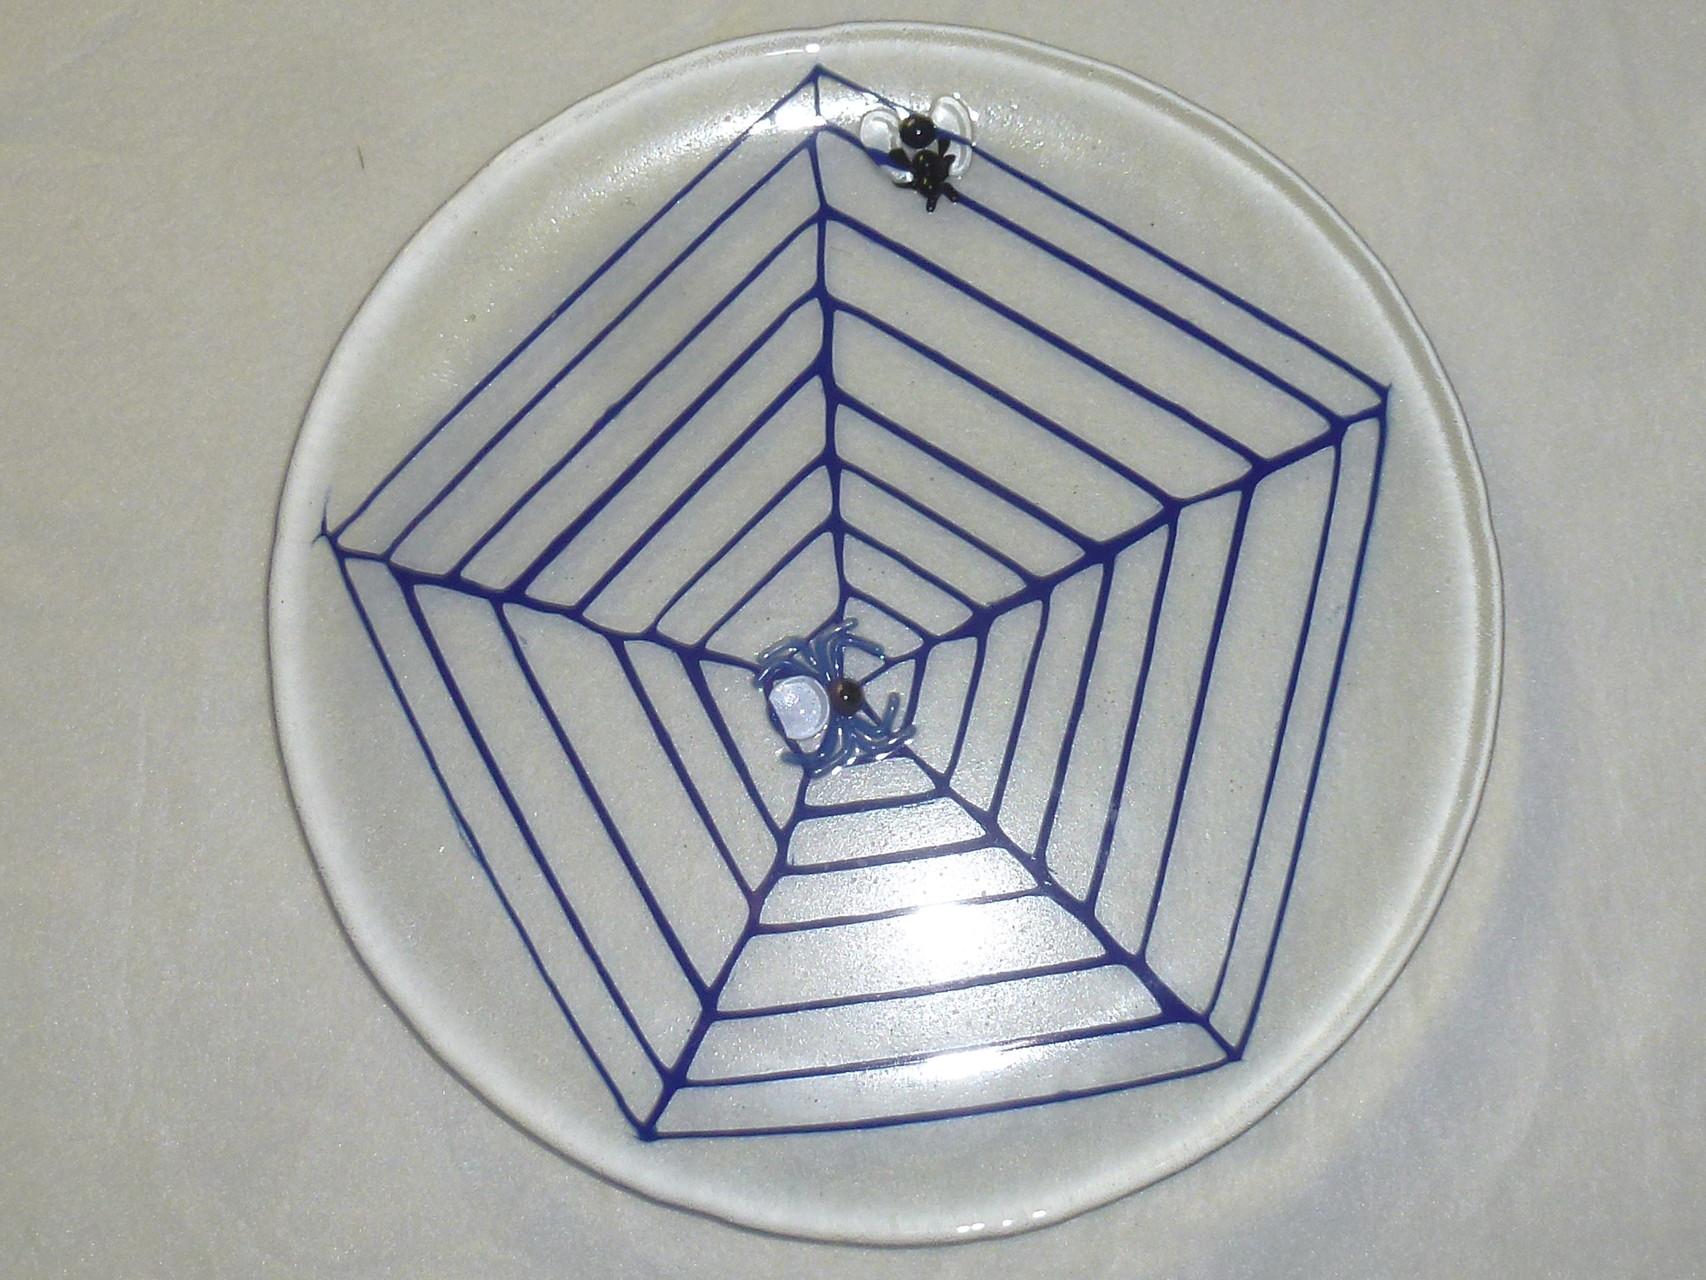 """Spinnenplatte""  ø zirka 28cm   Preis: Fr. 90.--"